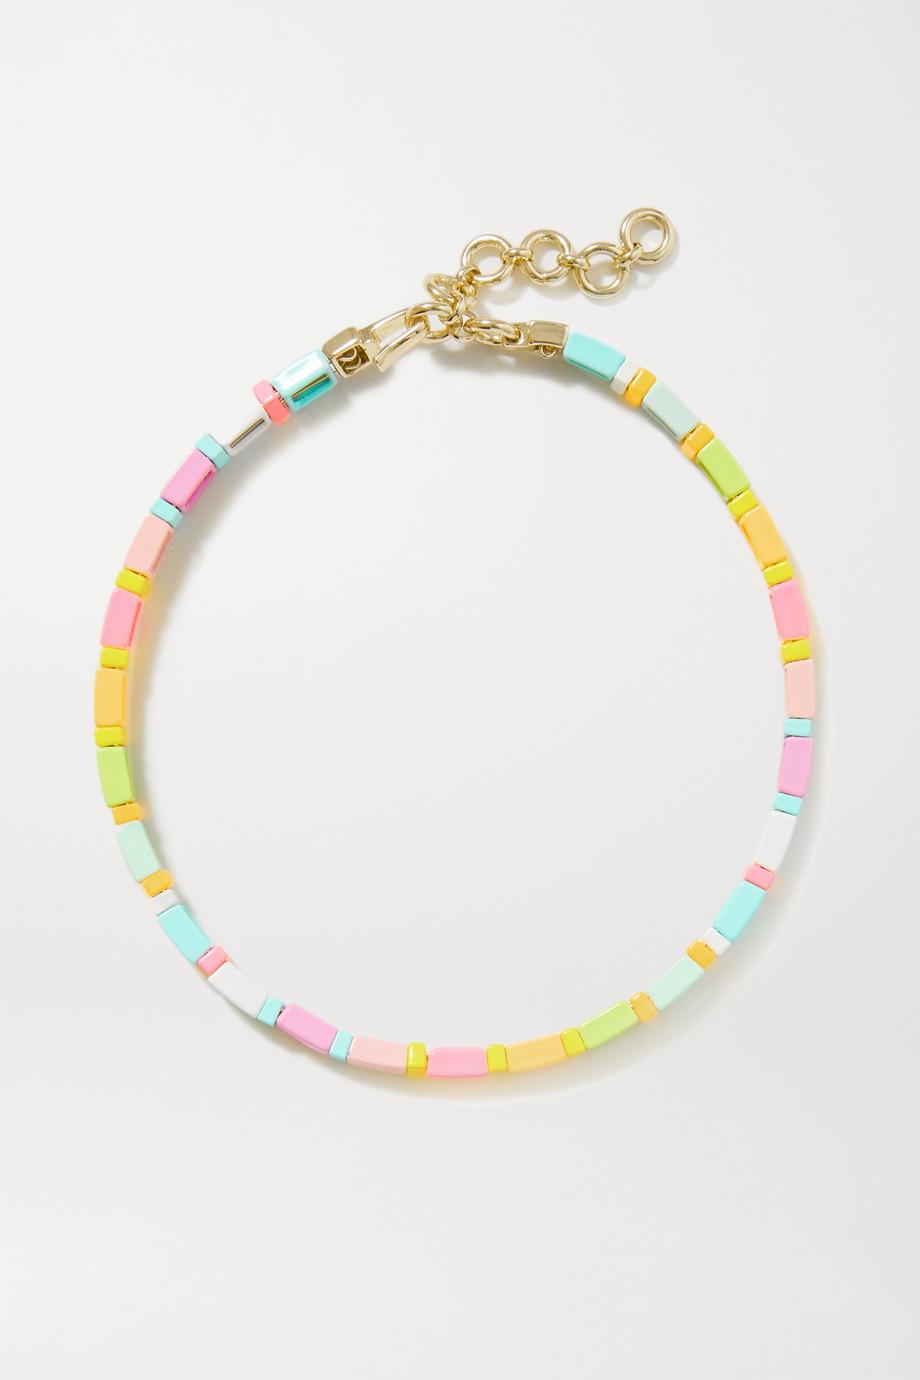 Roxanne Assoulin Neon Lite enamel and gold-tone choker